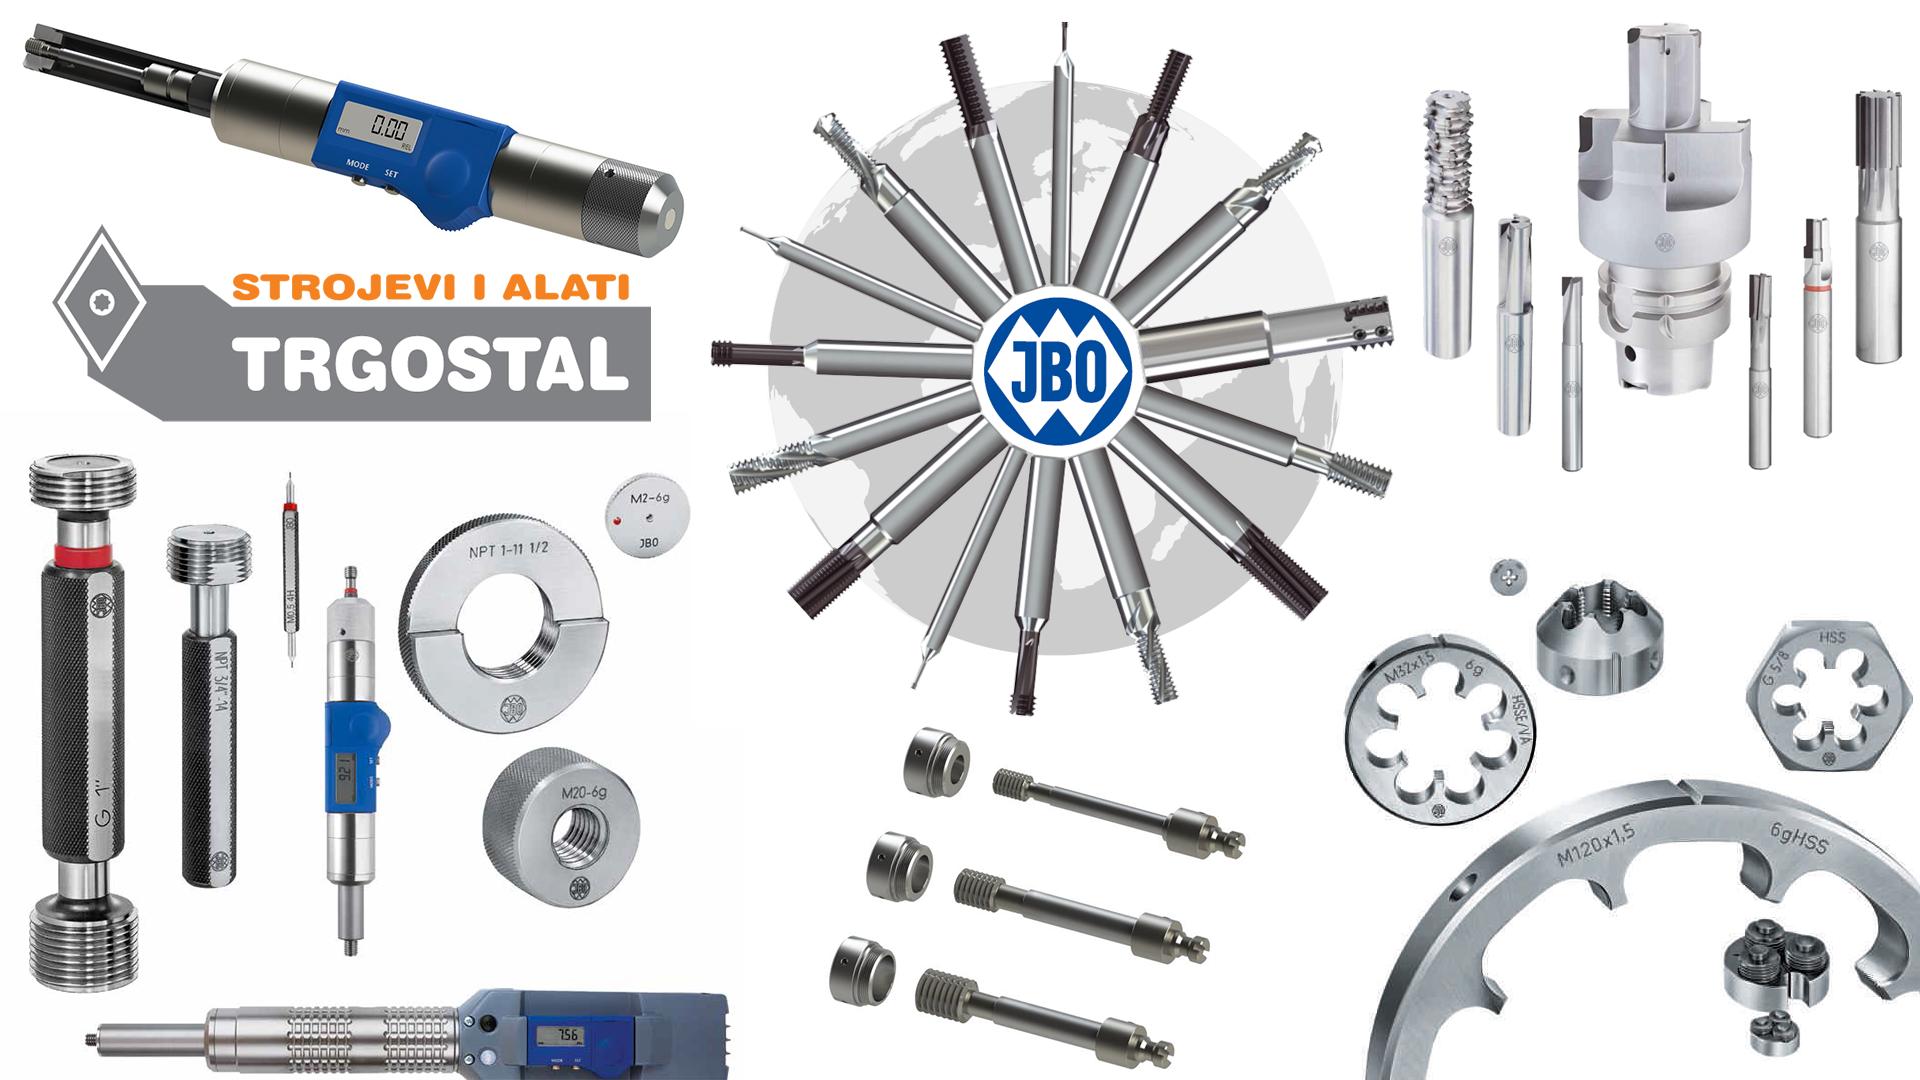 JOHS BOSS GmbH - Kontrolni kalibri i matice za navoje, glodala za izradu navoja